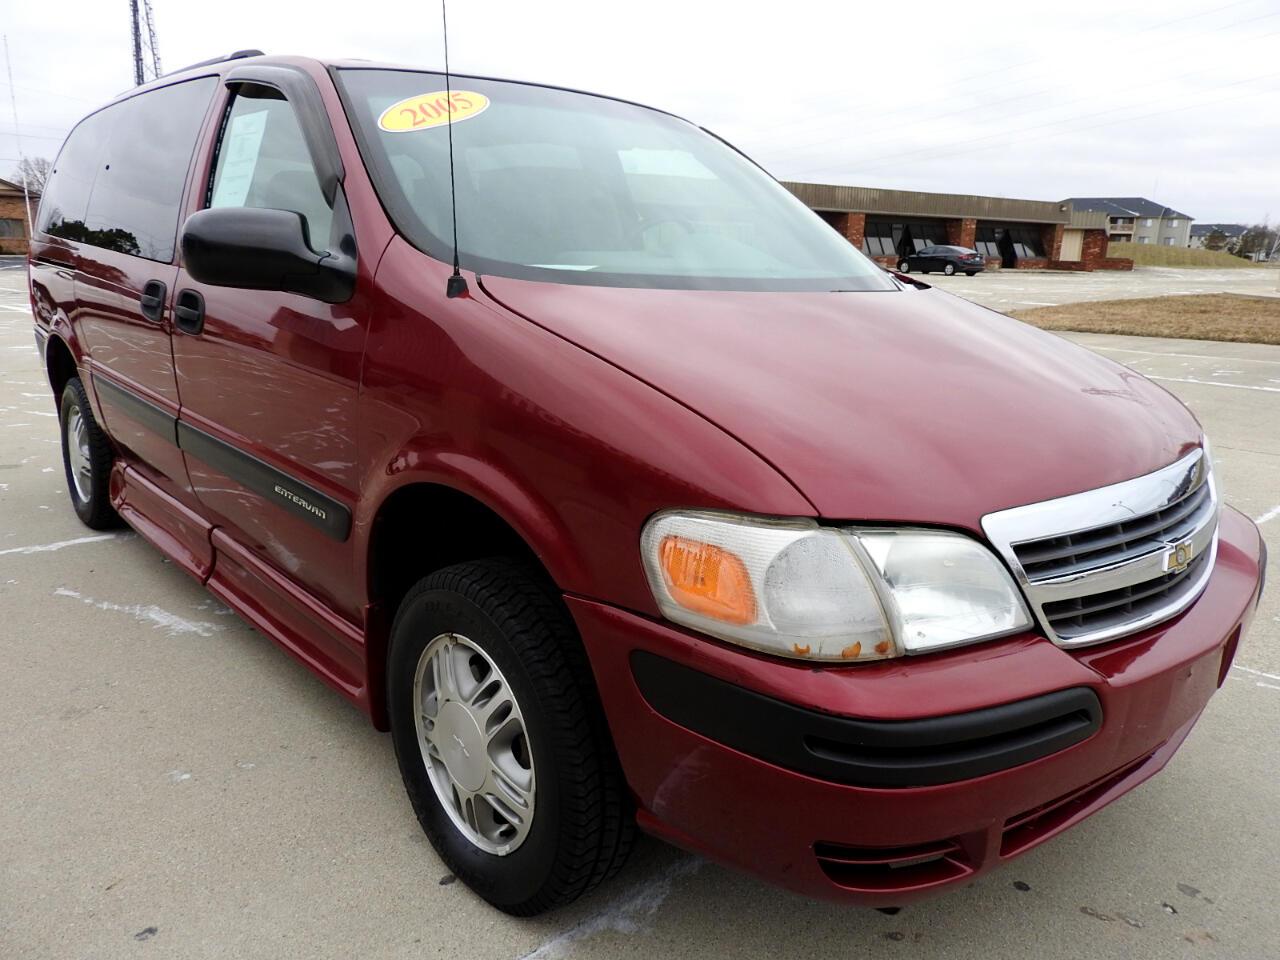 2005 Chevrolet Venture BRAUN MOBILITY